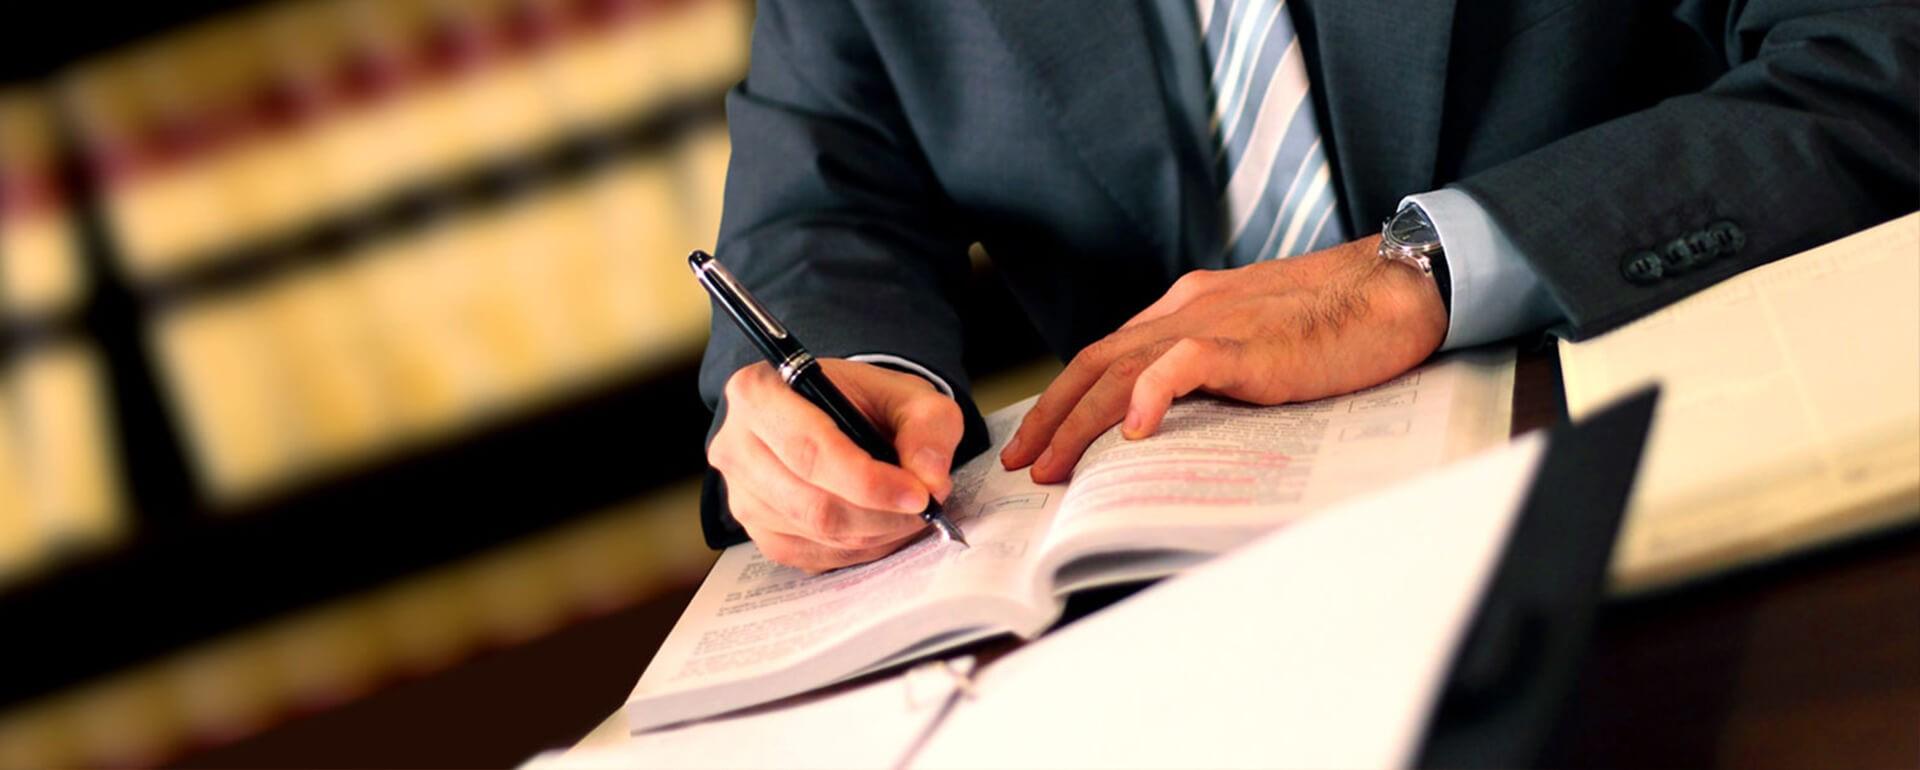 مشاوره با وکیل ملکی متخصص 2